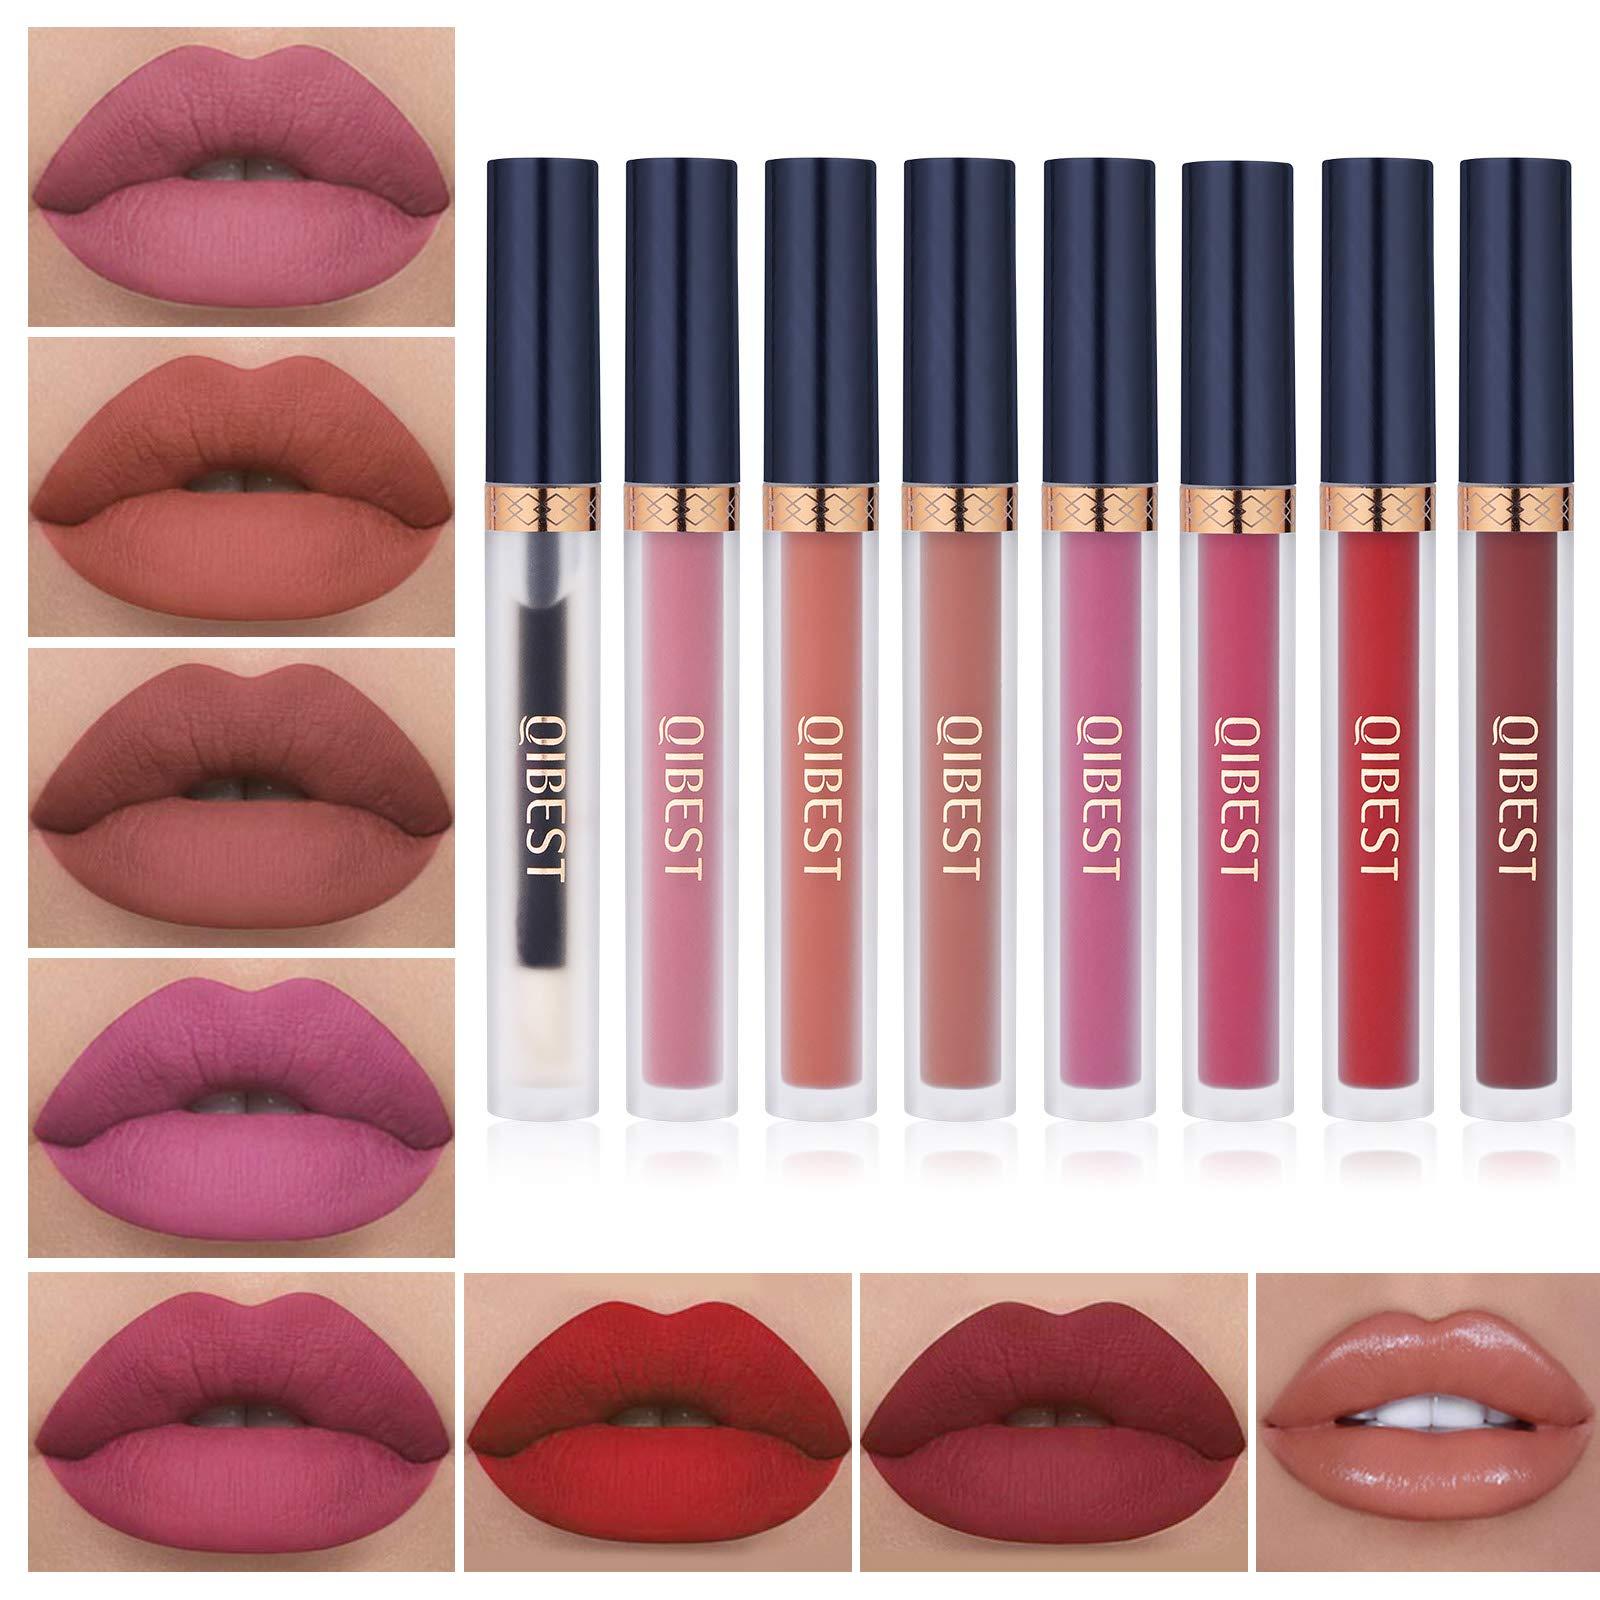 8pcs Matte Liquid Lipstick with Lip Plumper Makeup Set Velvety Long Lasting High Pigmented Nude Waterproof Lip Gloss Kit Girls Women Make Up Gift Set